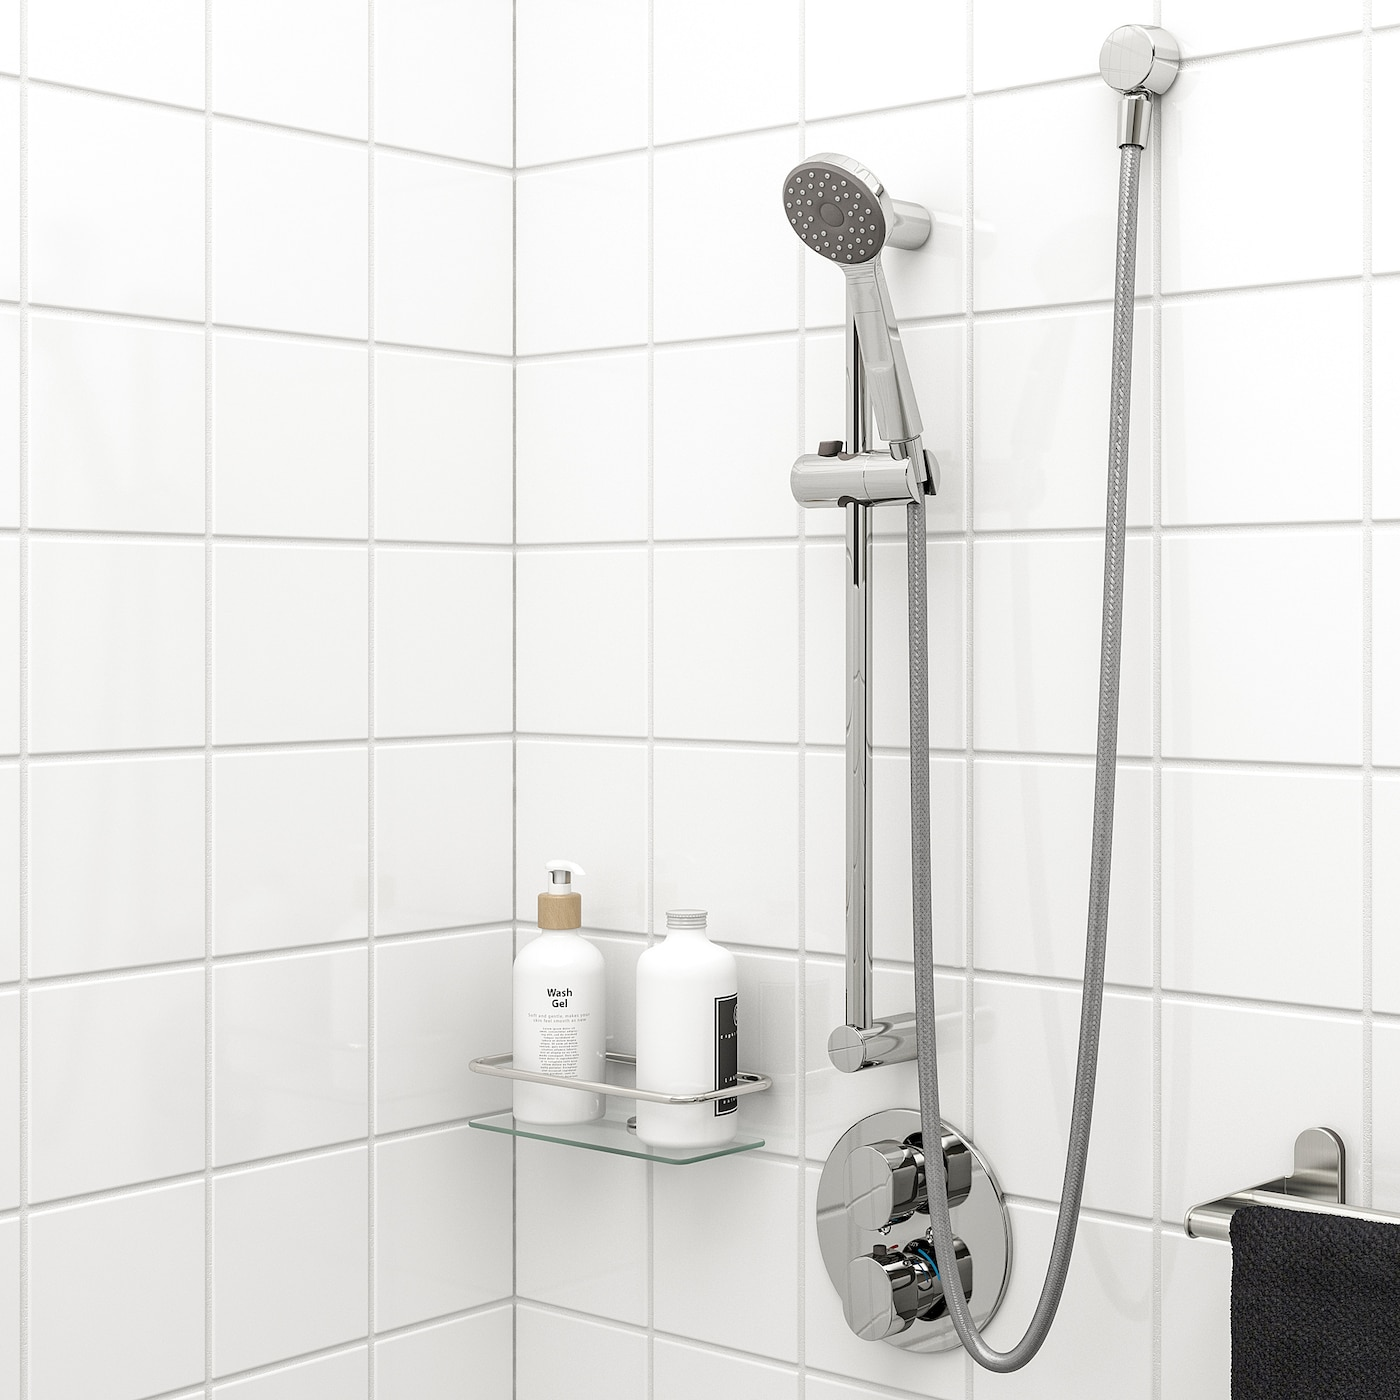 Steel Hose Chrome Shower Head Holder Riser Rail Bar Complete with Shower Head